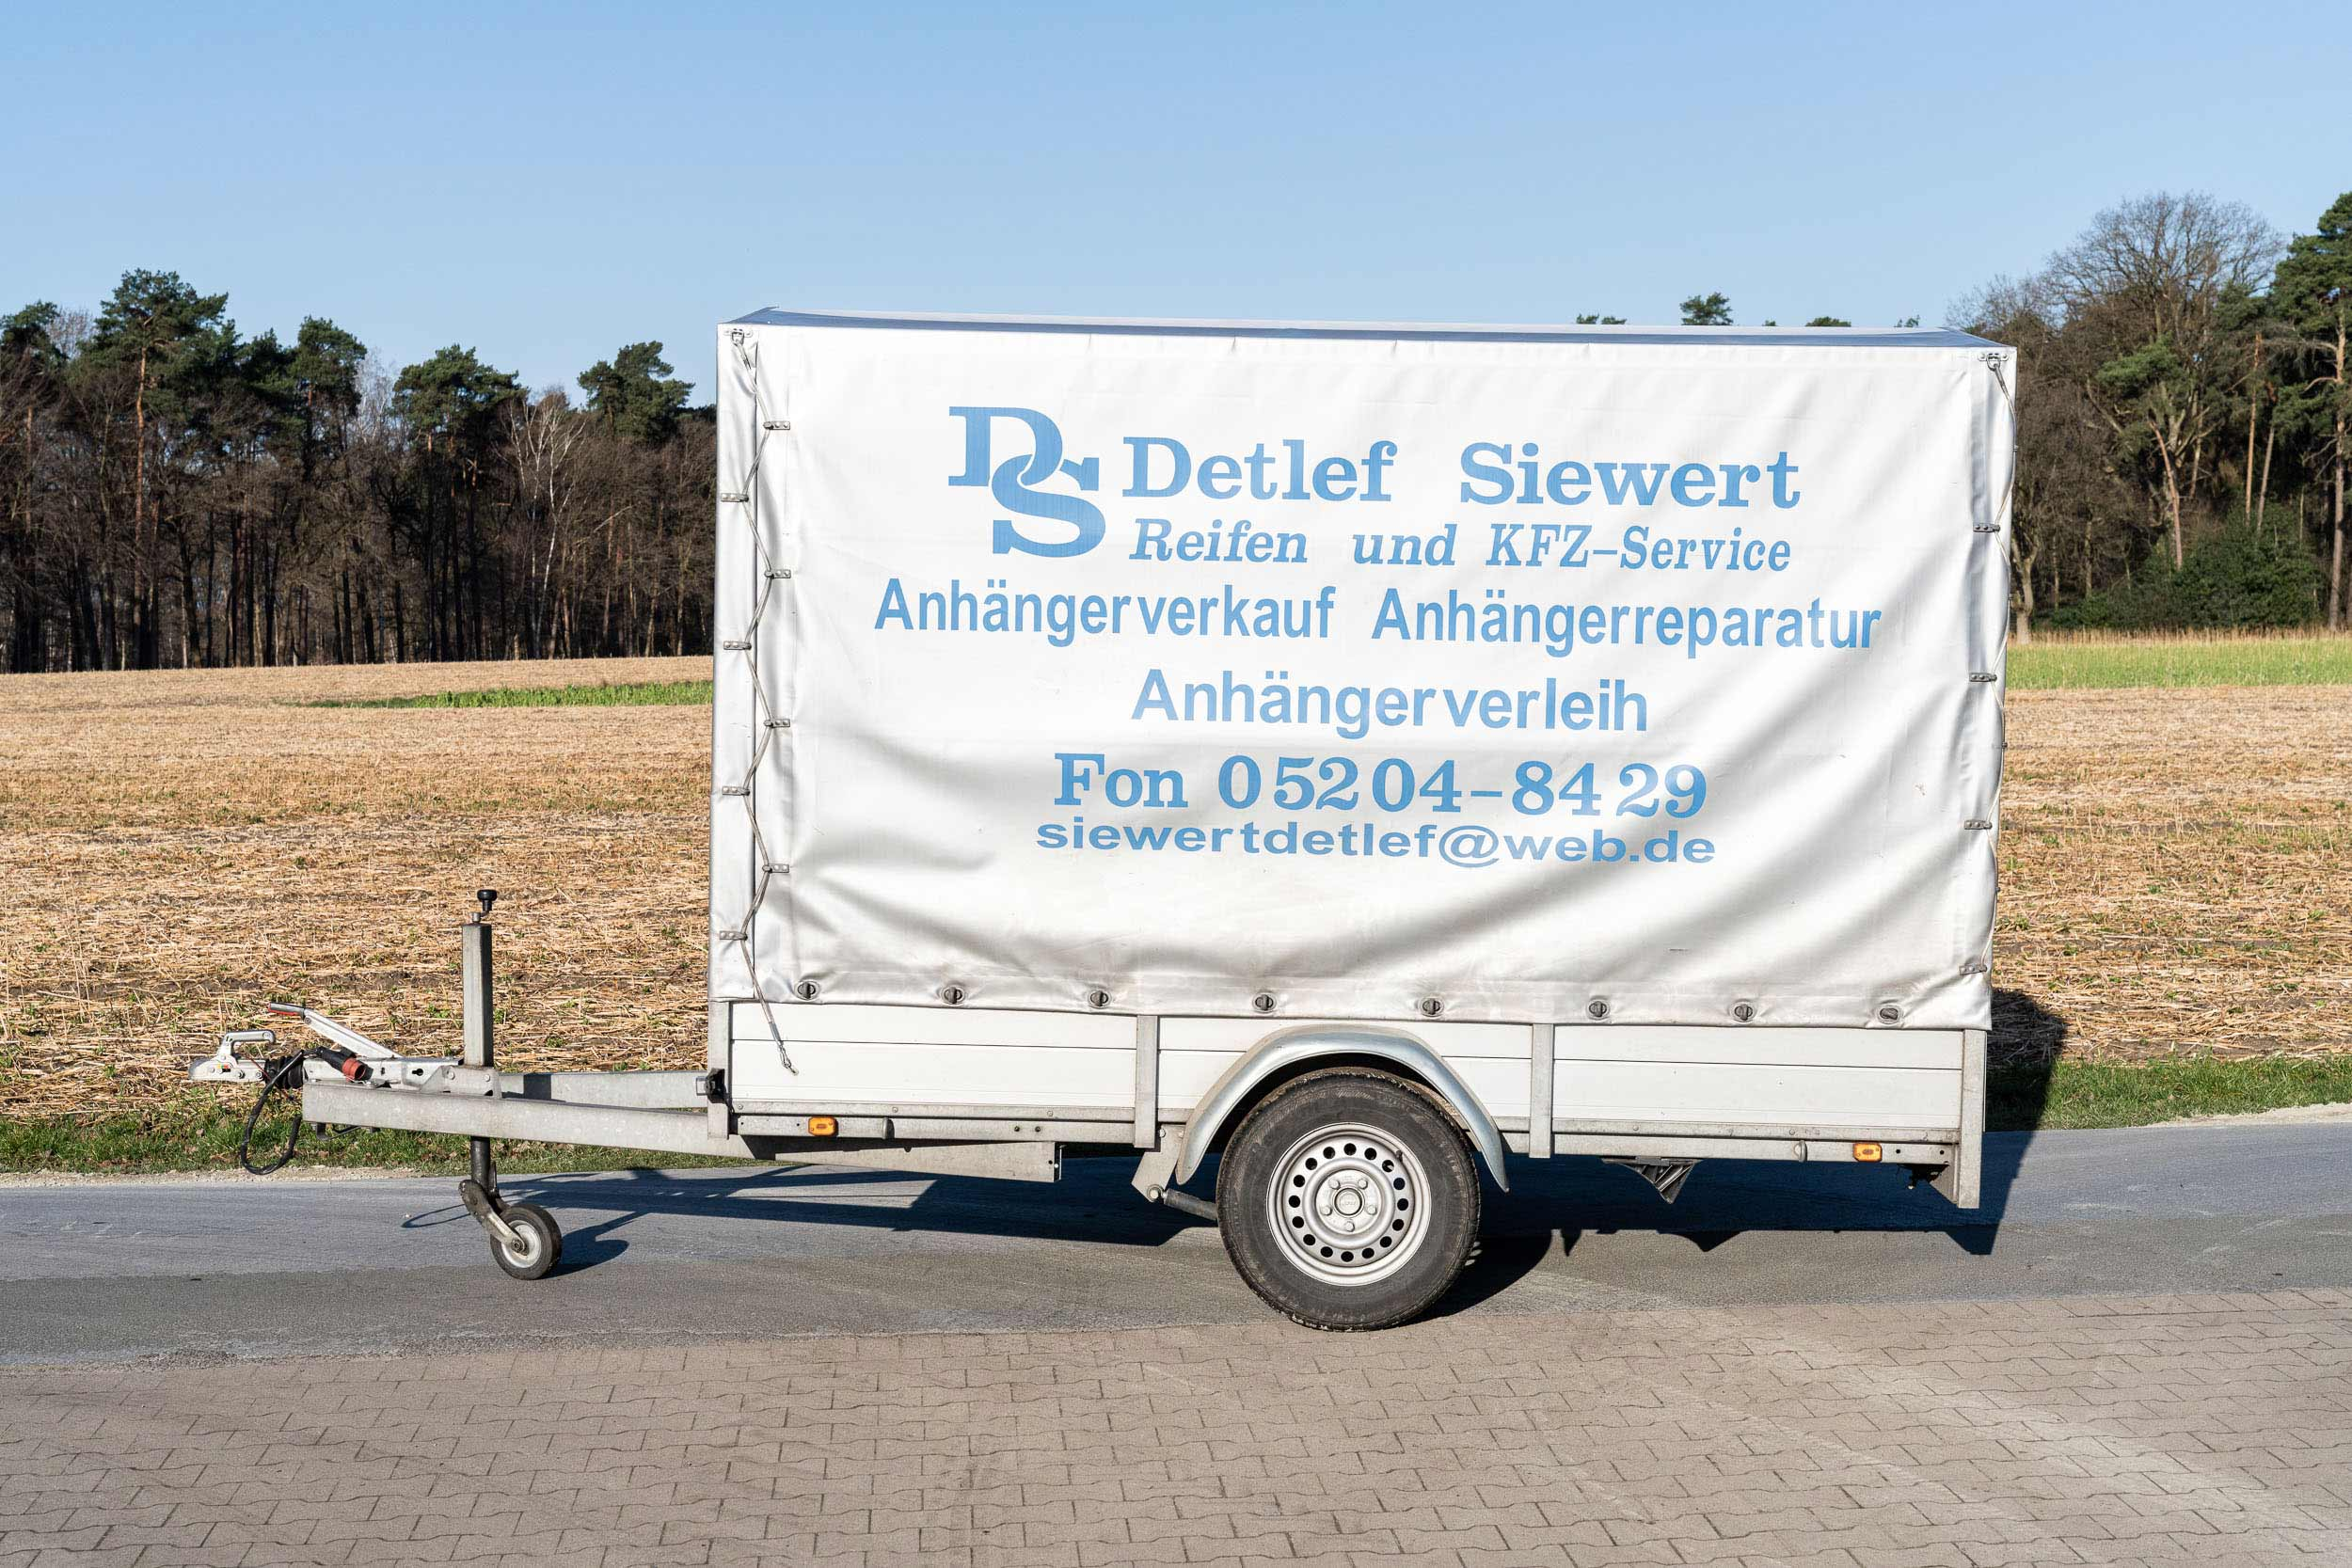 PKW-Anhaenger-Verleih-Siewert-1500kg-300x150x200